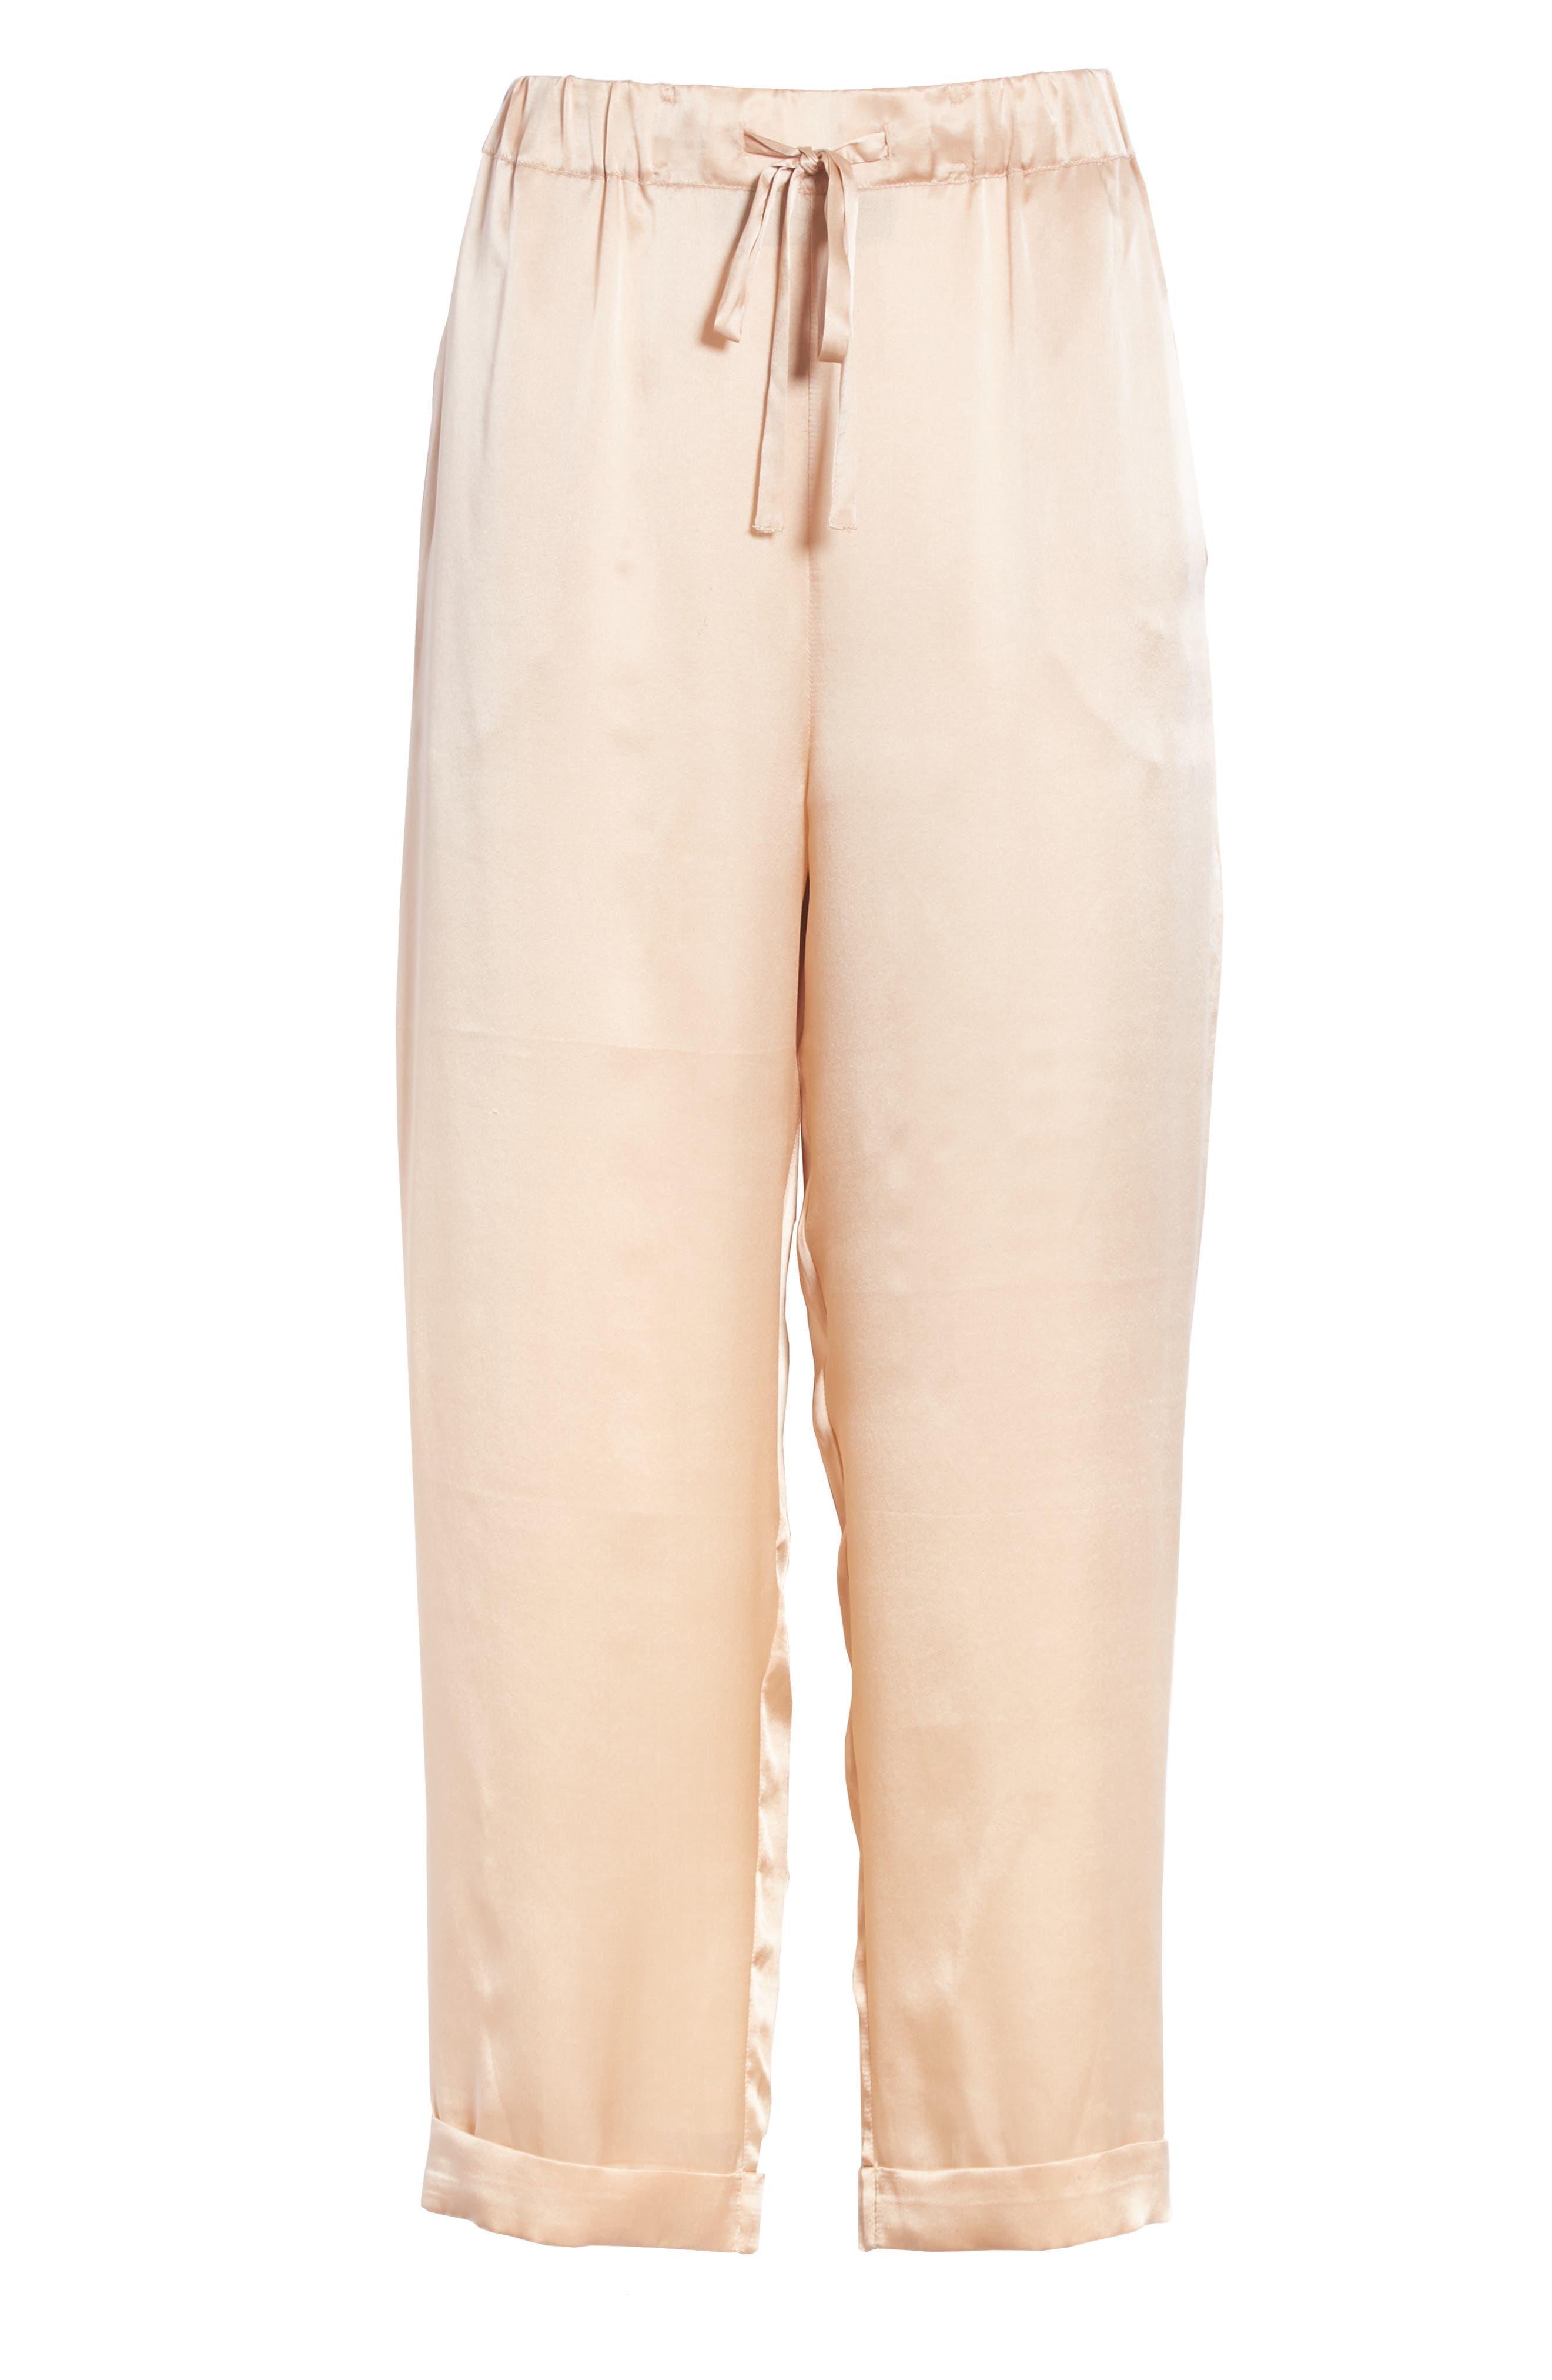 Fester Silk Ankle Pants,                             Alternate thumbnail 6, color,                             250